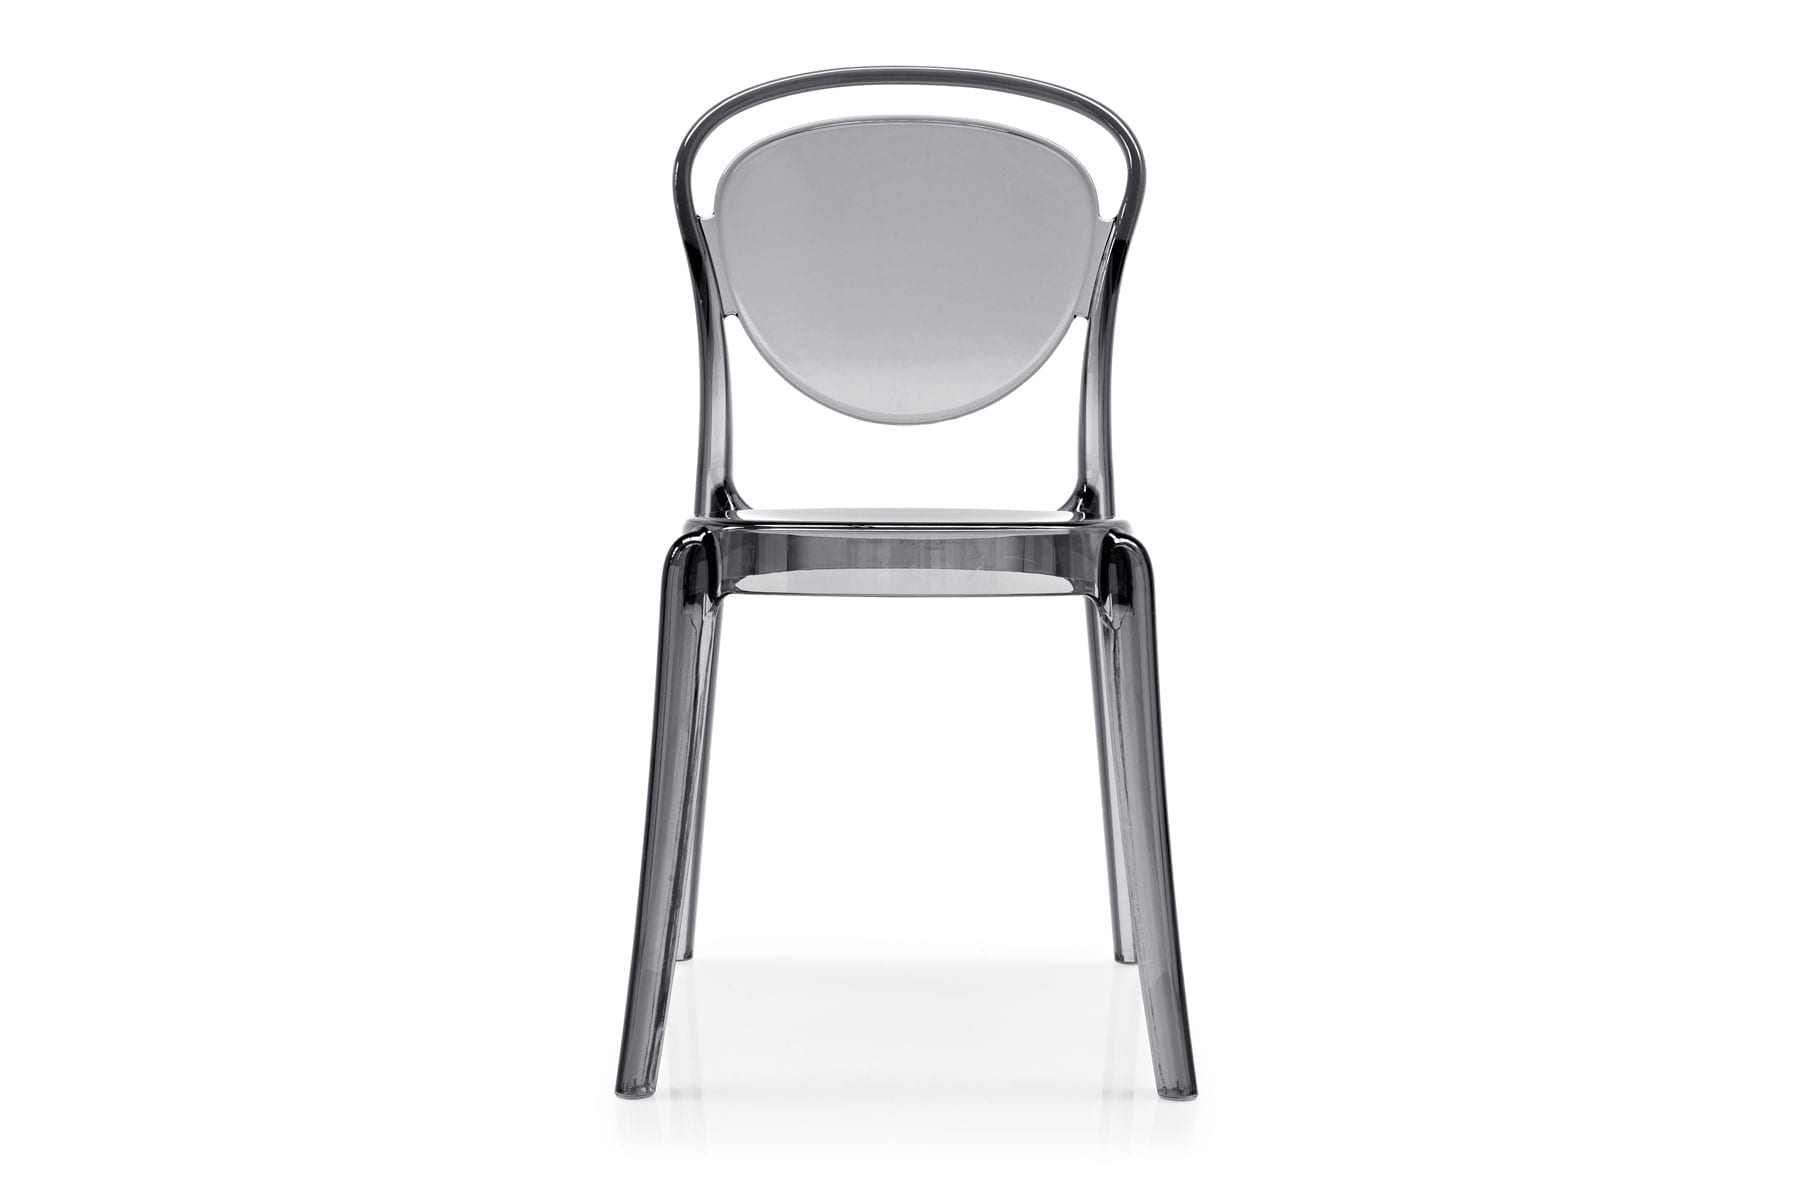 dining chairs nz kimball fit chair calligaris parisienne mckenzie willis